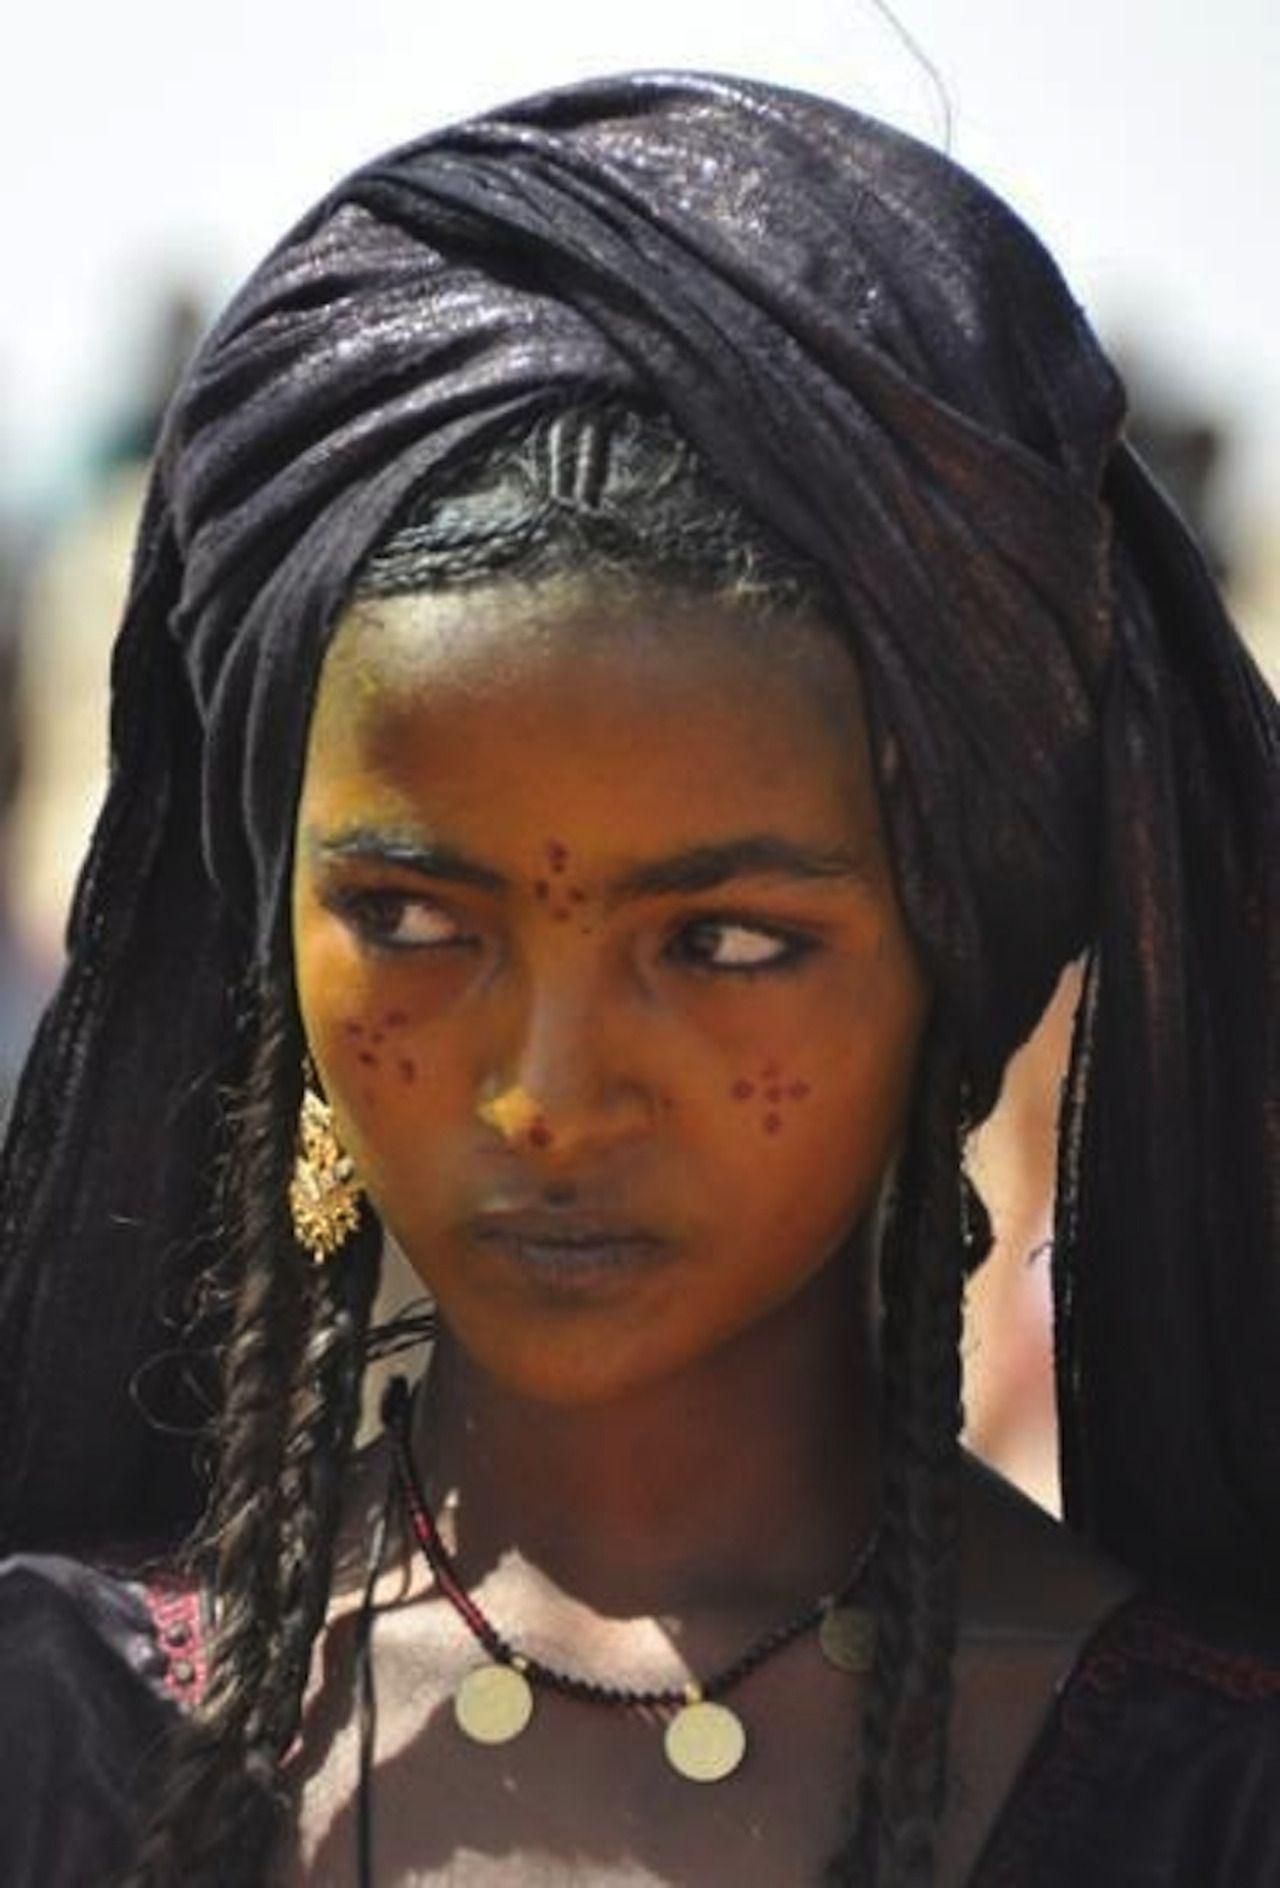 maquillage femme touareg